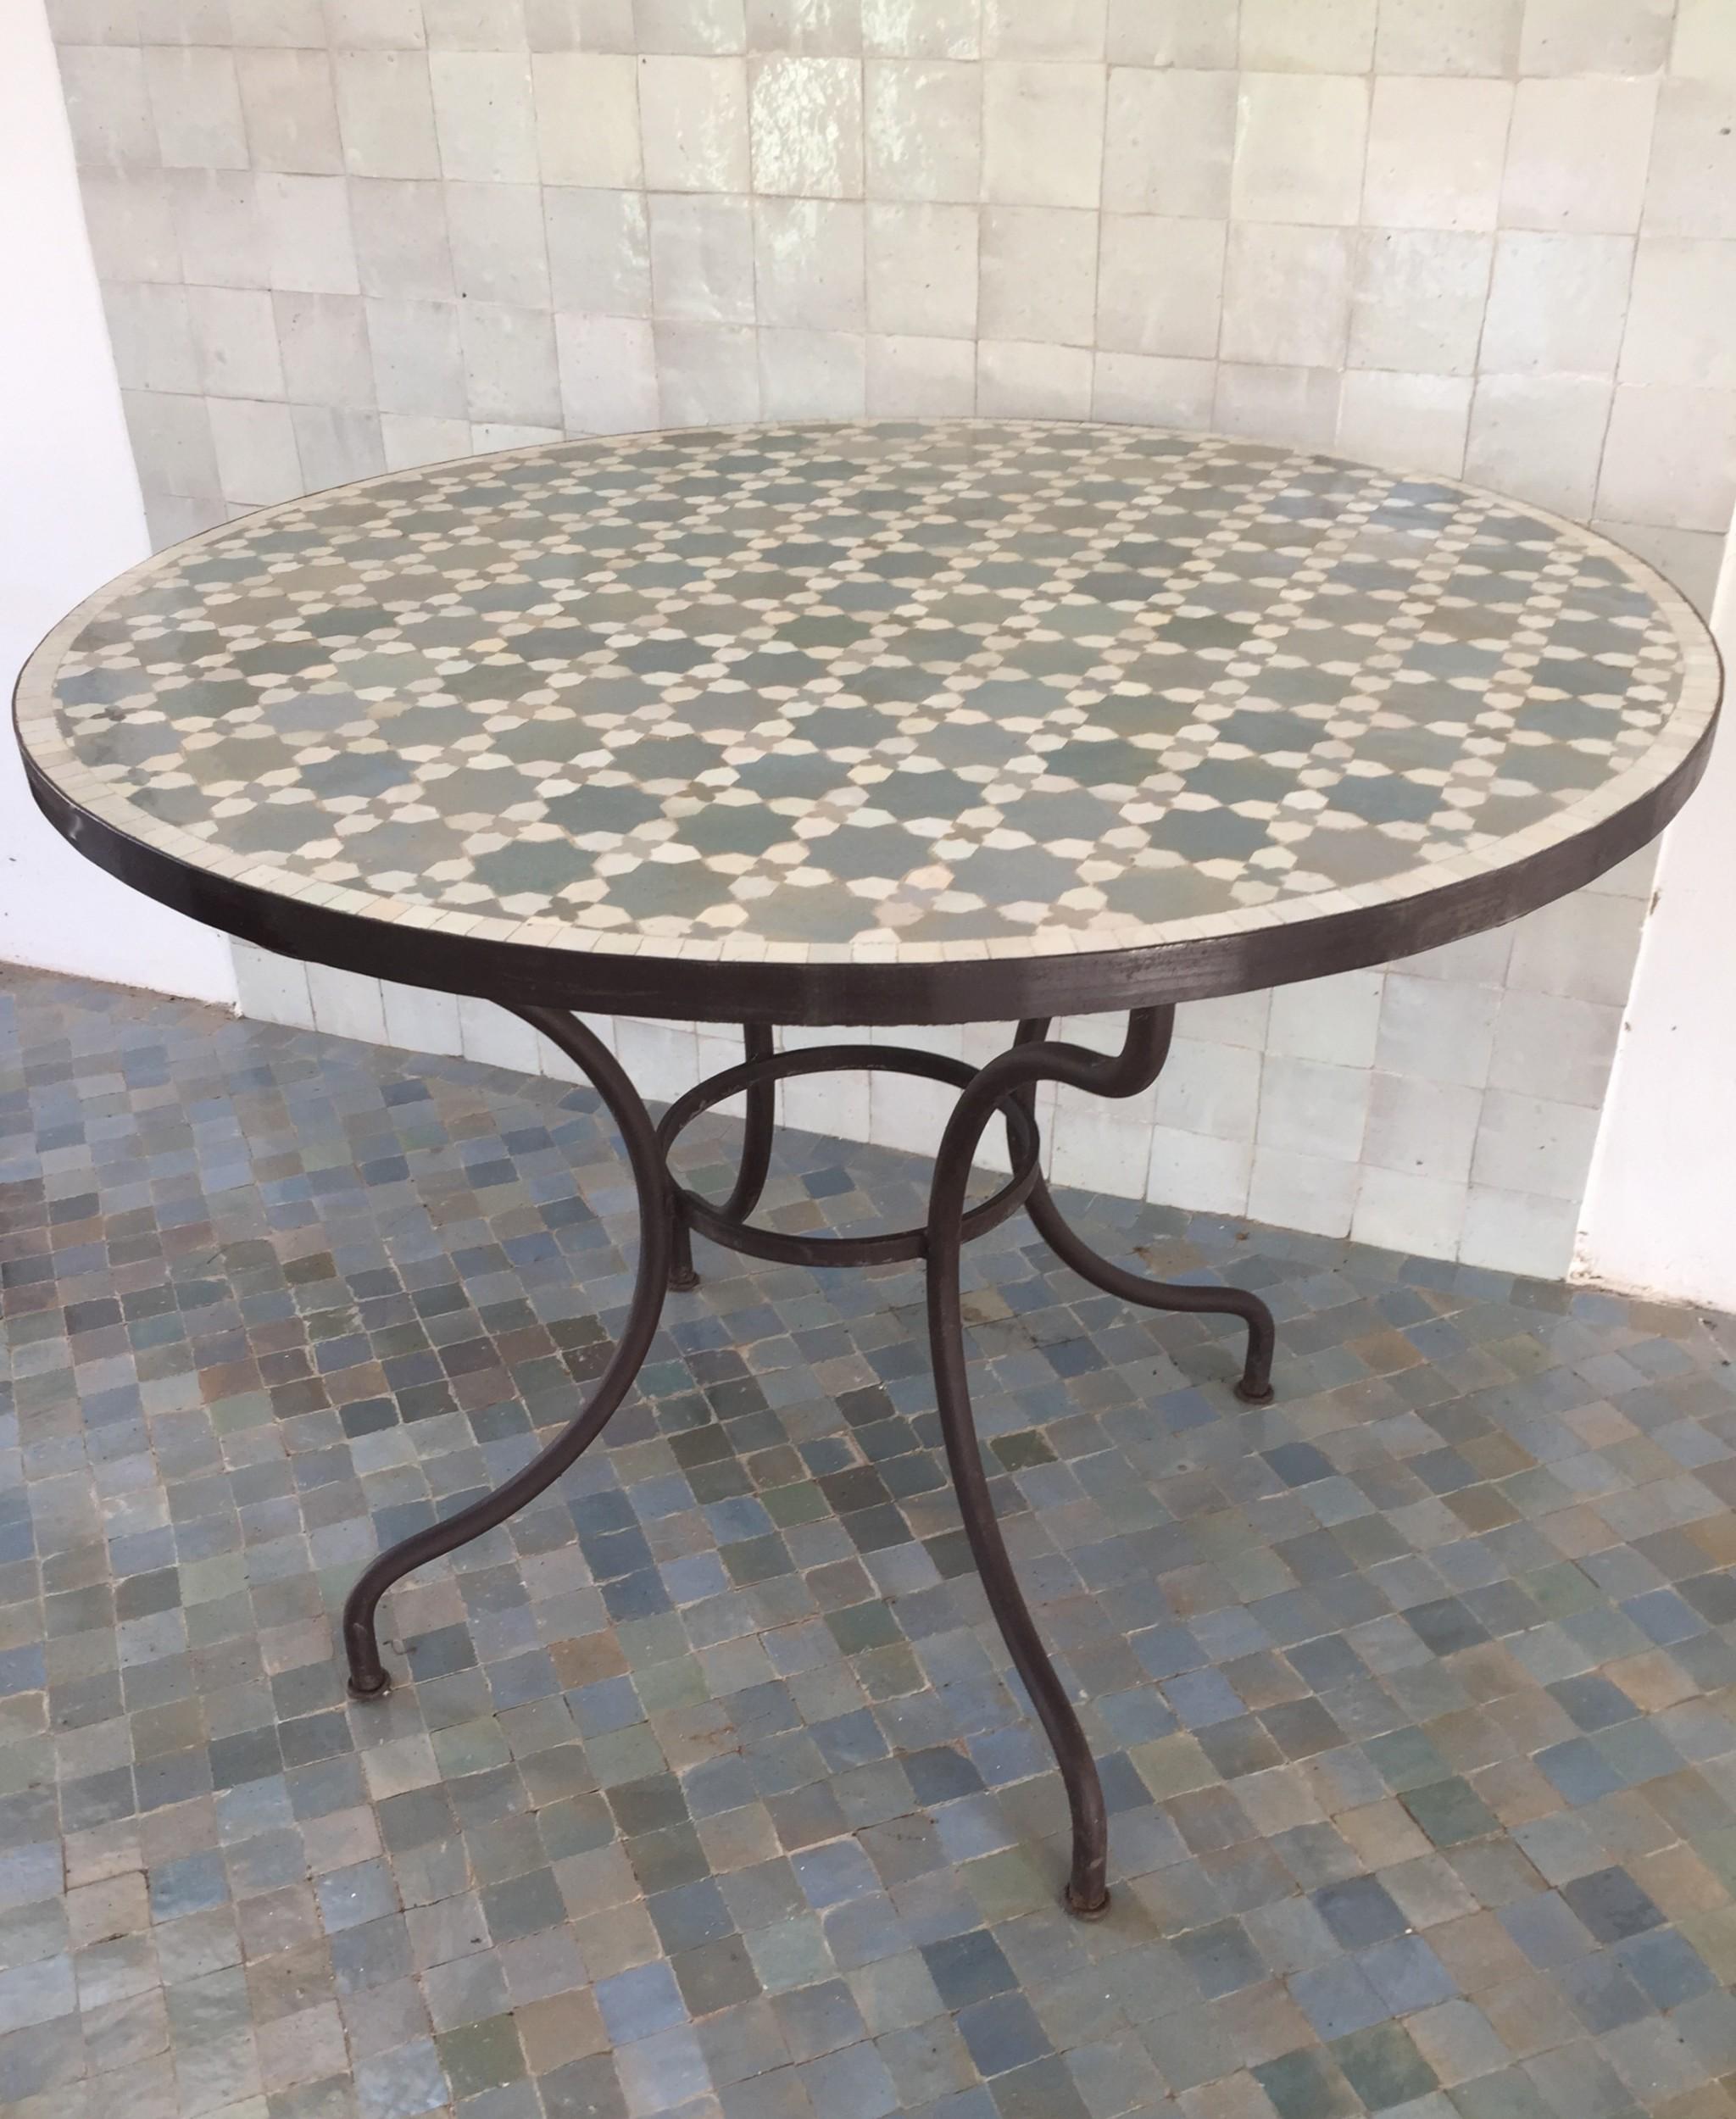 Table Ronde Zellige Art Et Sud Deco